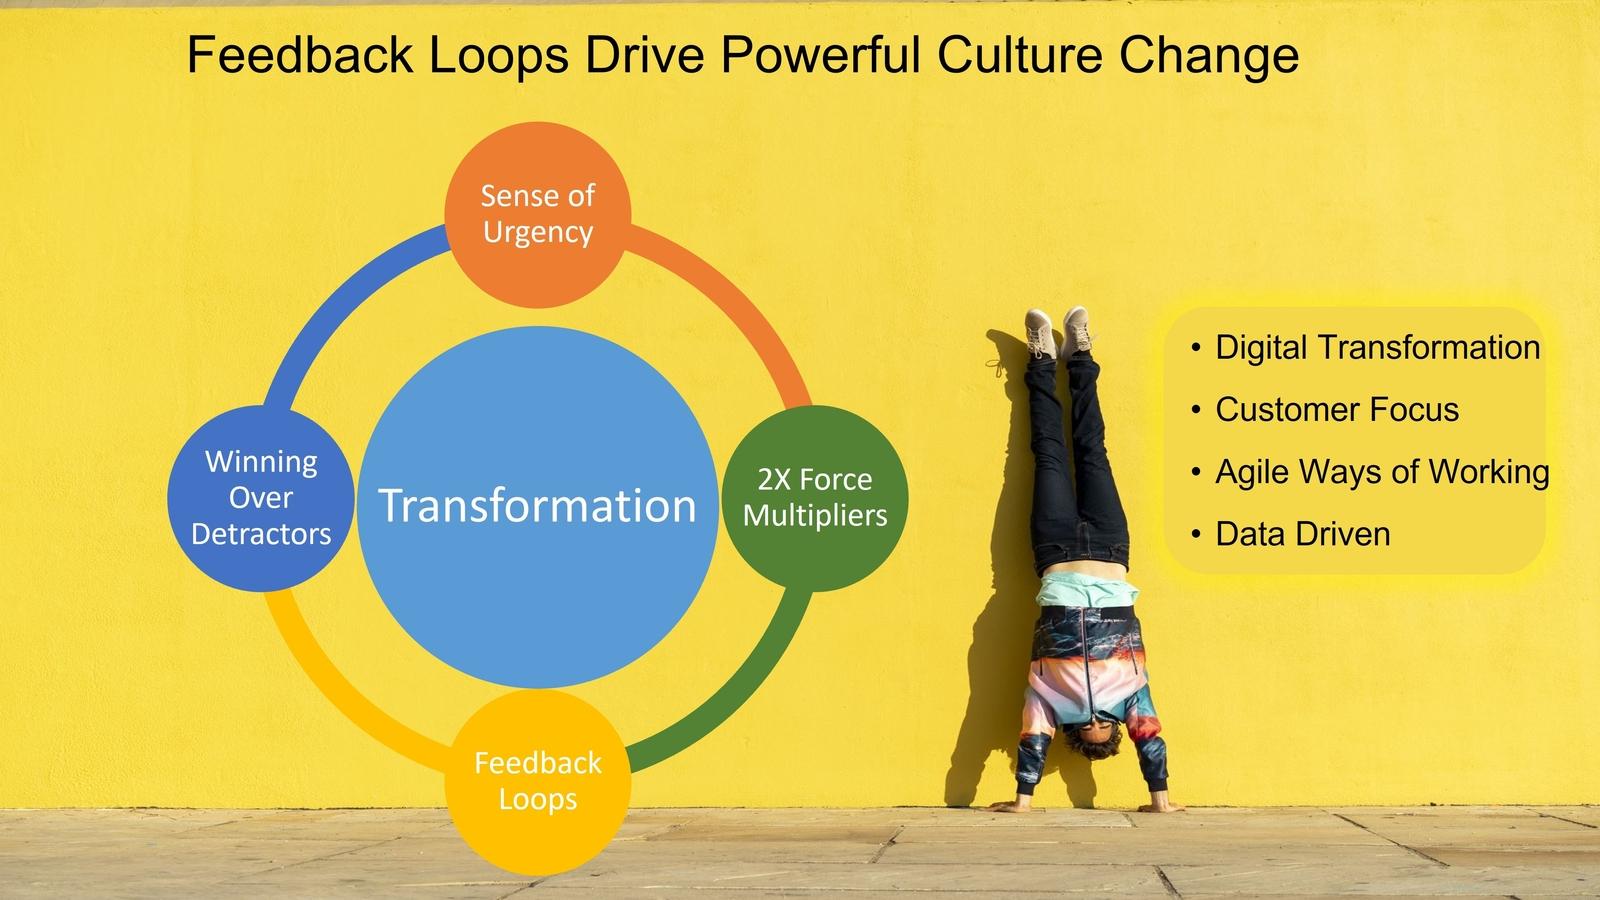 Agile and Digital Transformation Feedback Loops by Isaac Sacolick